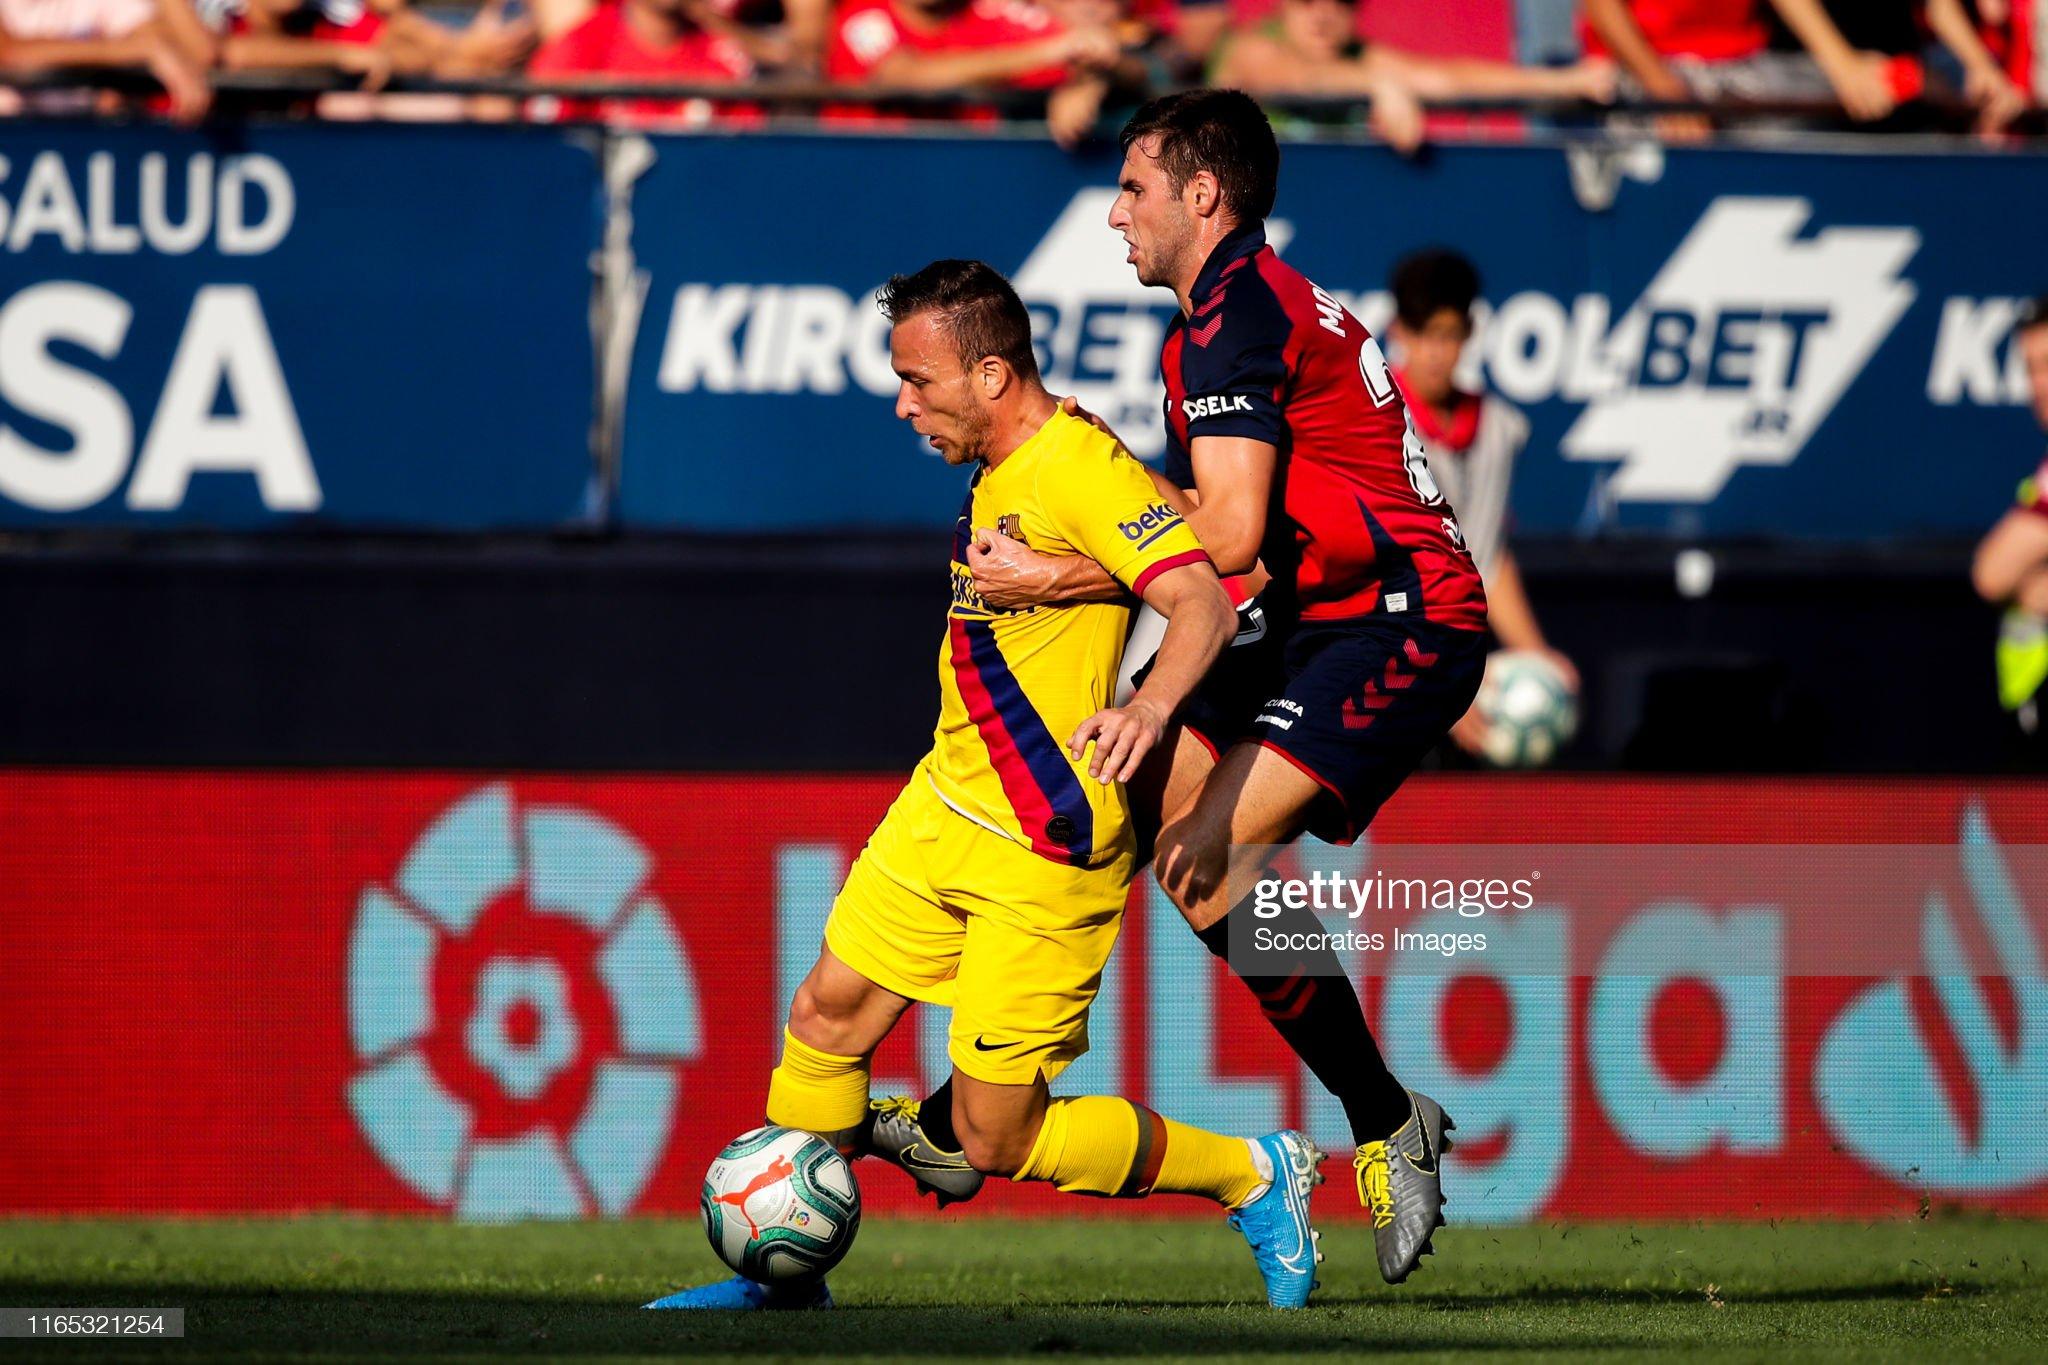 صور مباراة : أوساسونا - برشلونة 2-2 ( 31-08-2019 )  Arthur-of-fc-barcelona-nacho-vidal-of-ca-osasuna-during-the-la-liga-picture-id1165321254?s=2048x2048